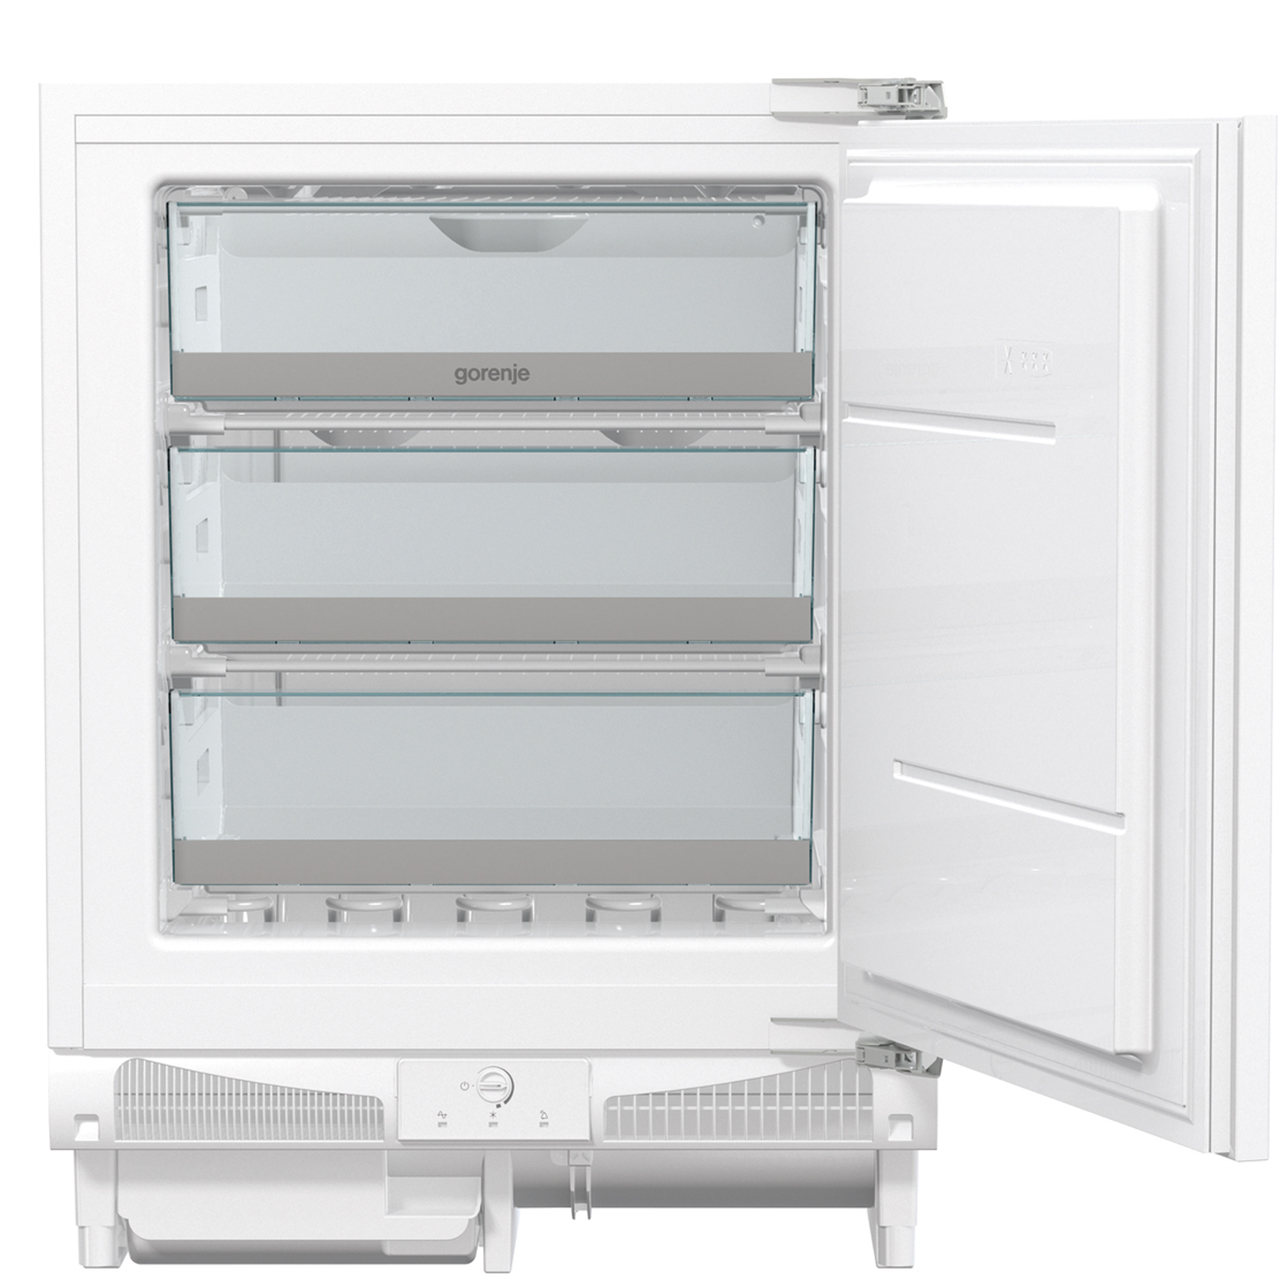 Gorenje Essential Line FIU6F091AWUK Integrated Under Counter Freezer review